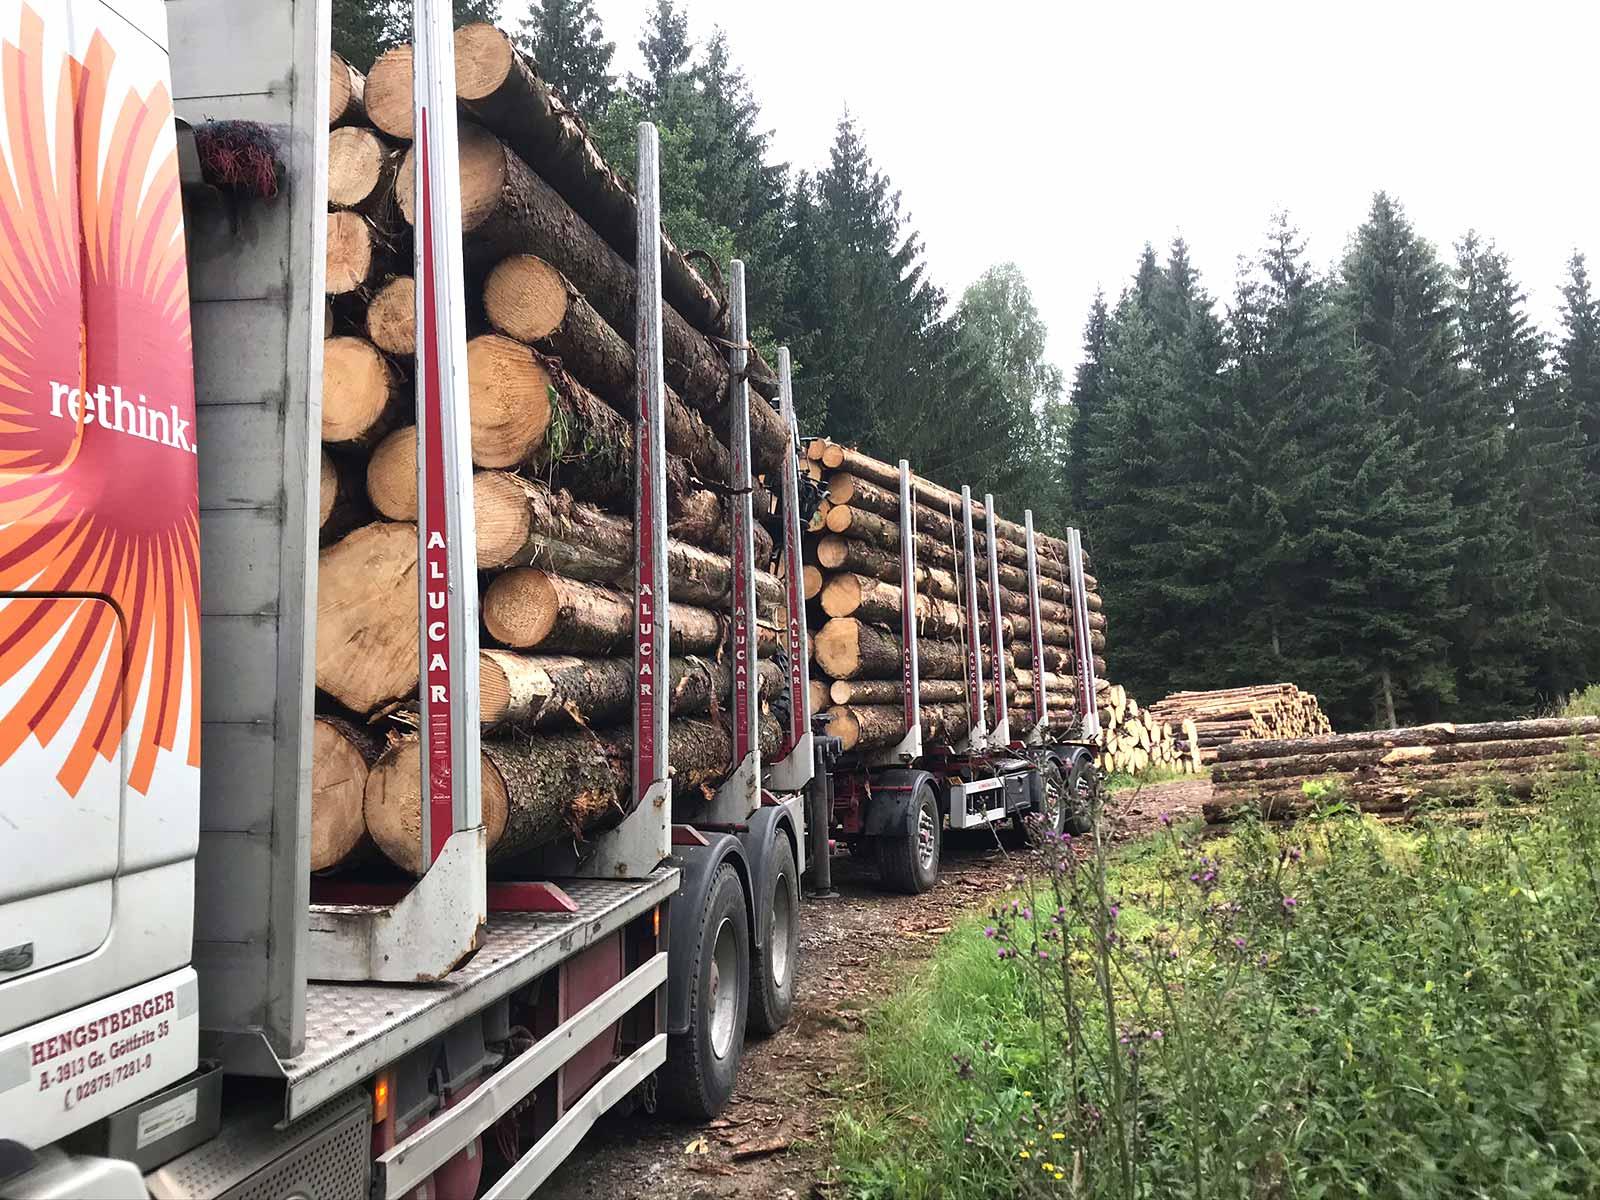 Hengstberger LKW storaenso im Wald